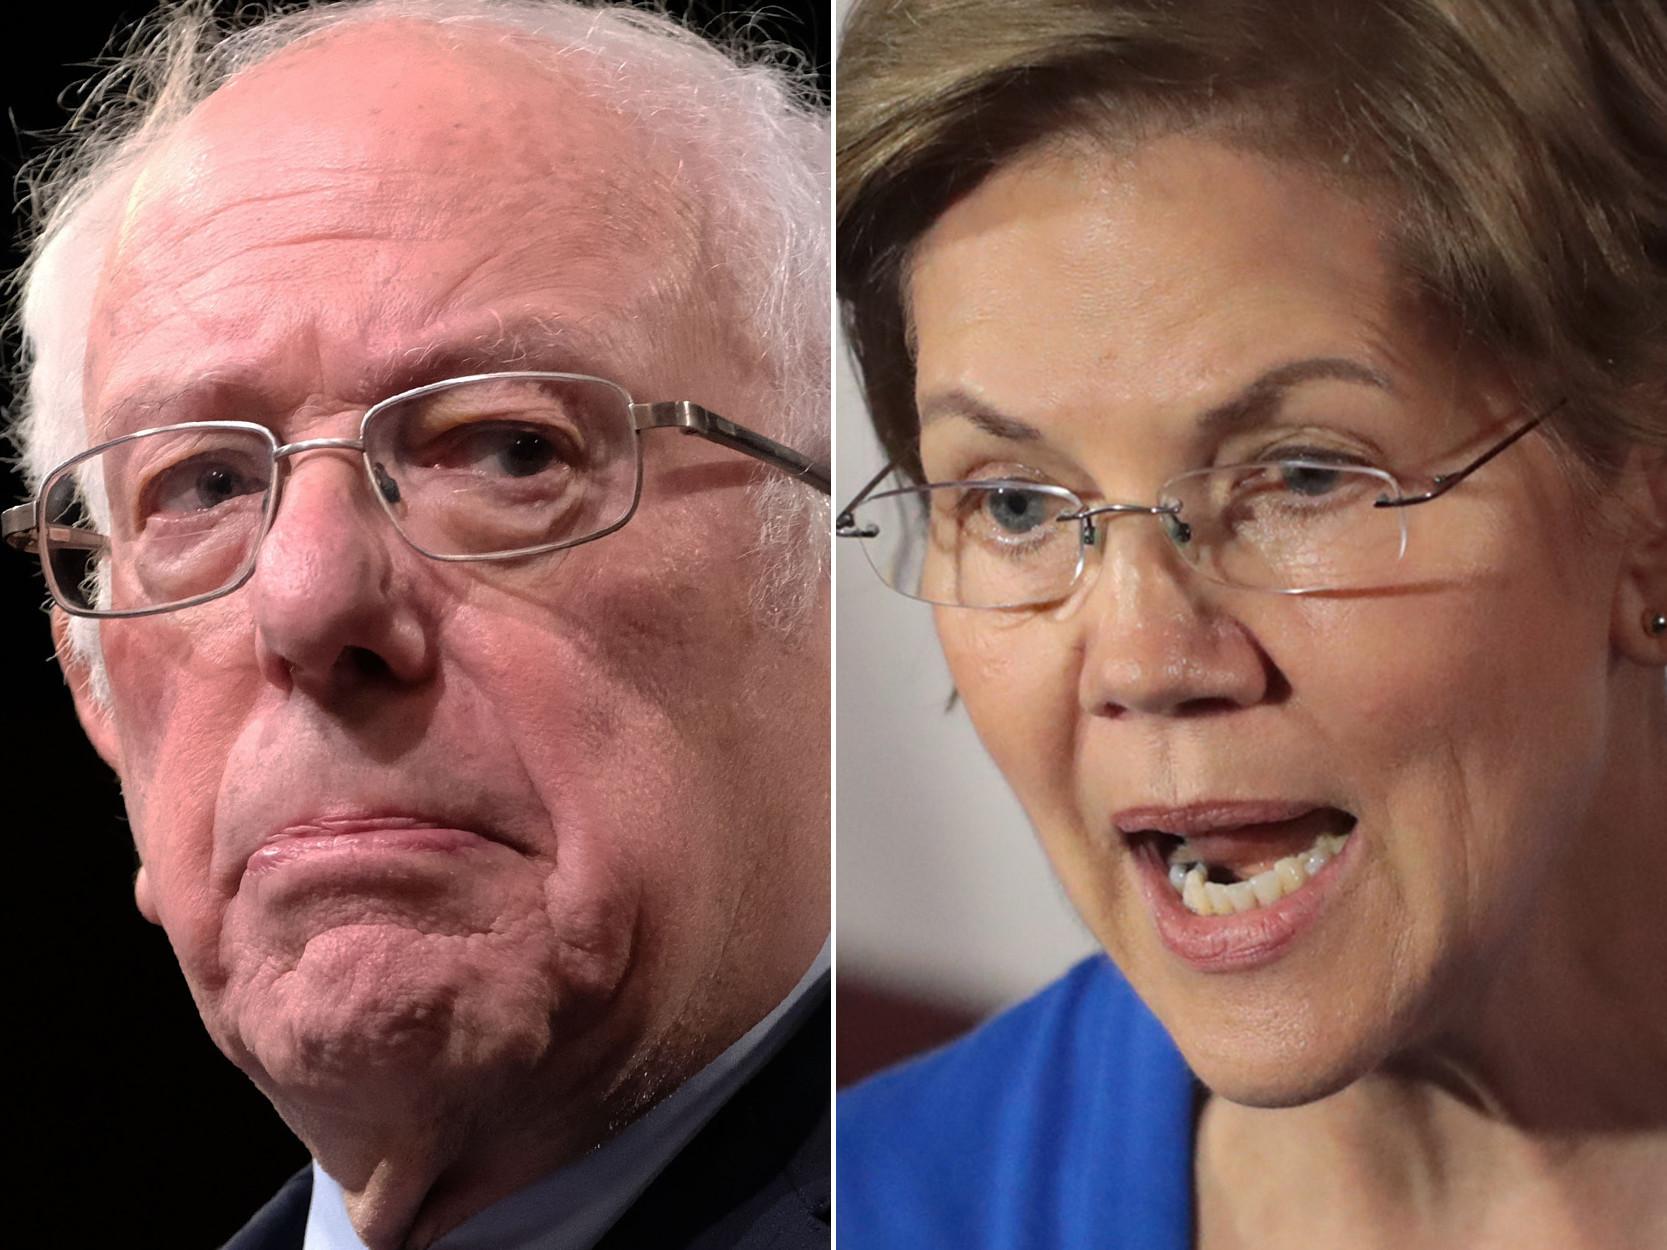 Dems should celebrate Sanders' and Warren's conscious uncoupling